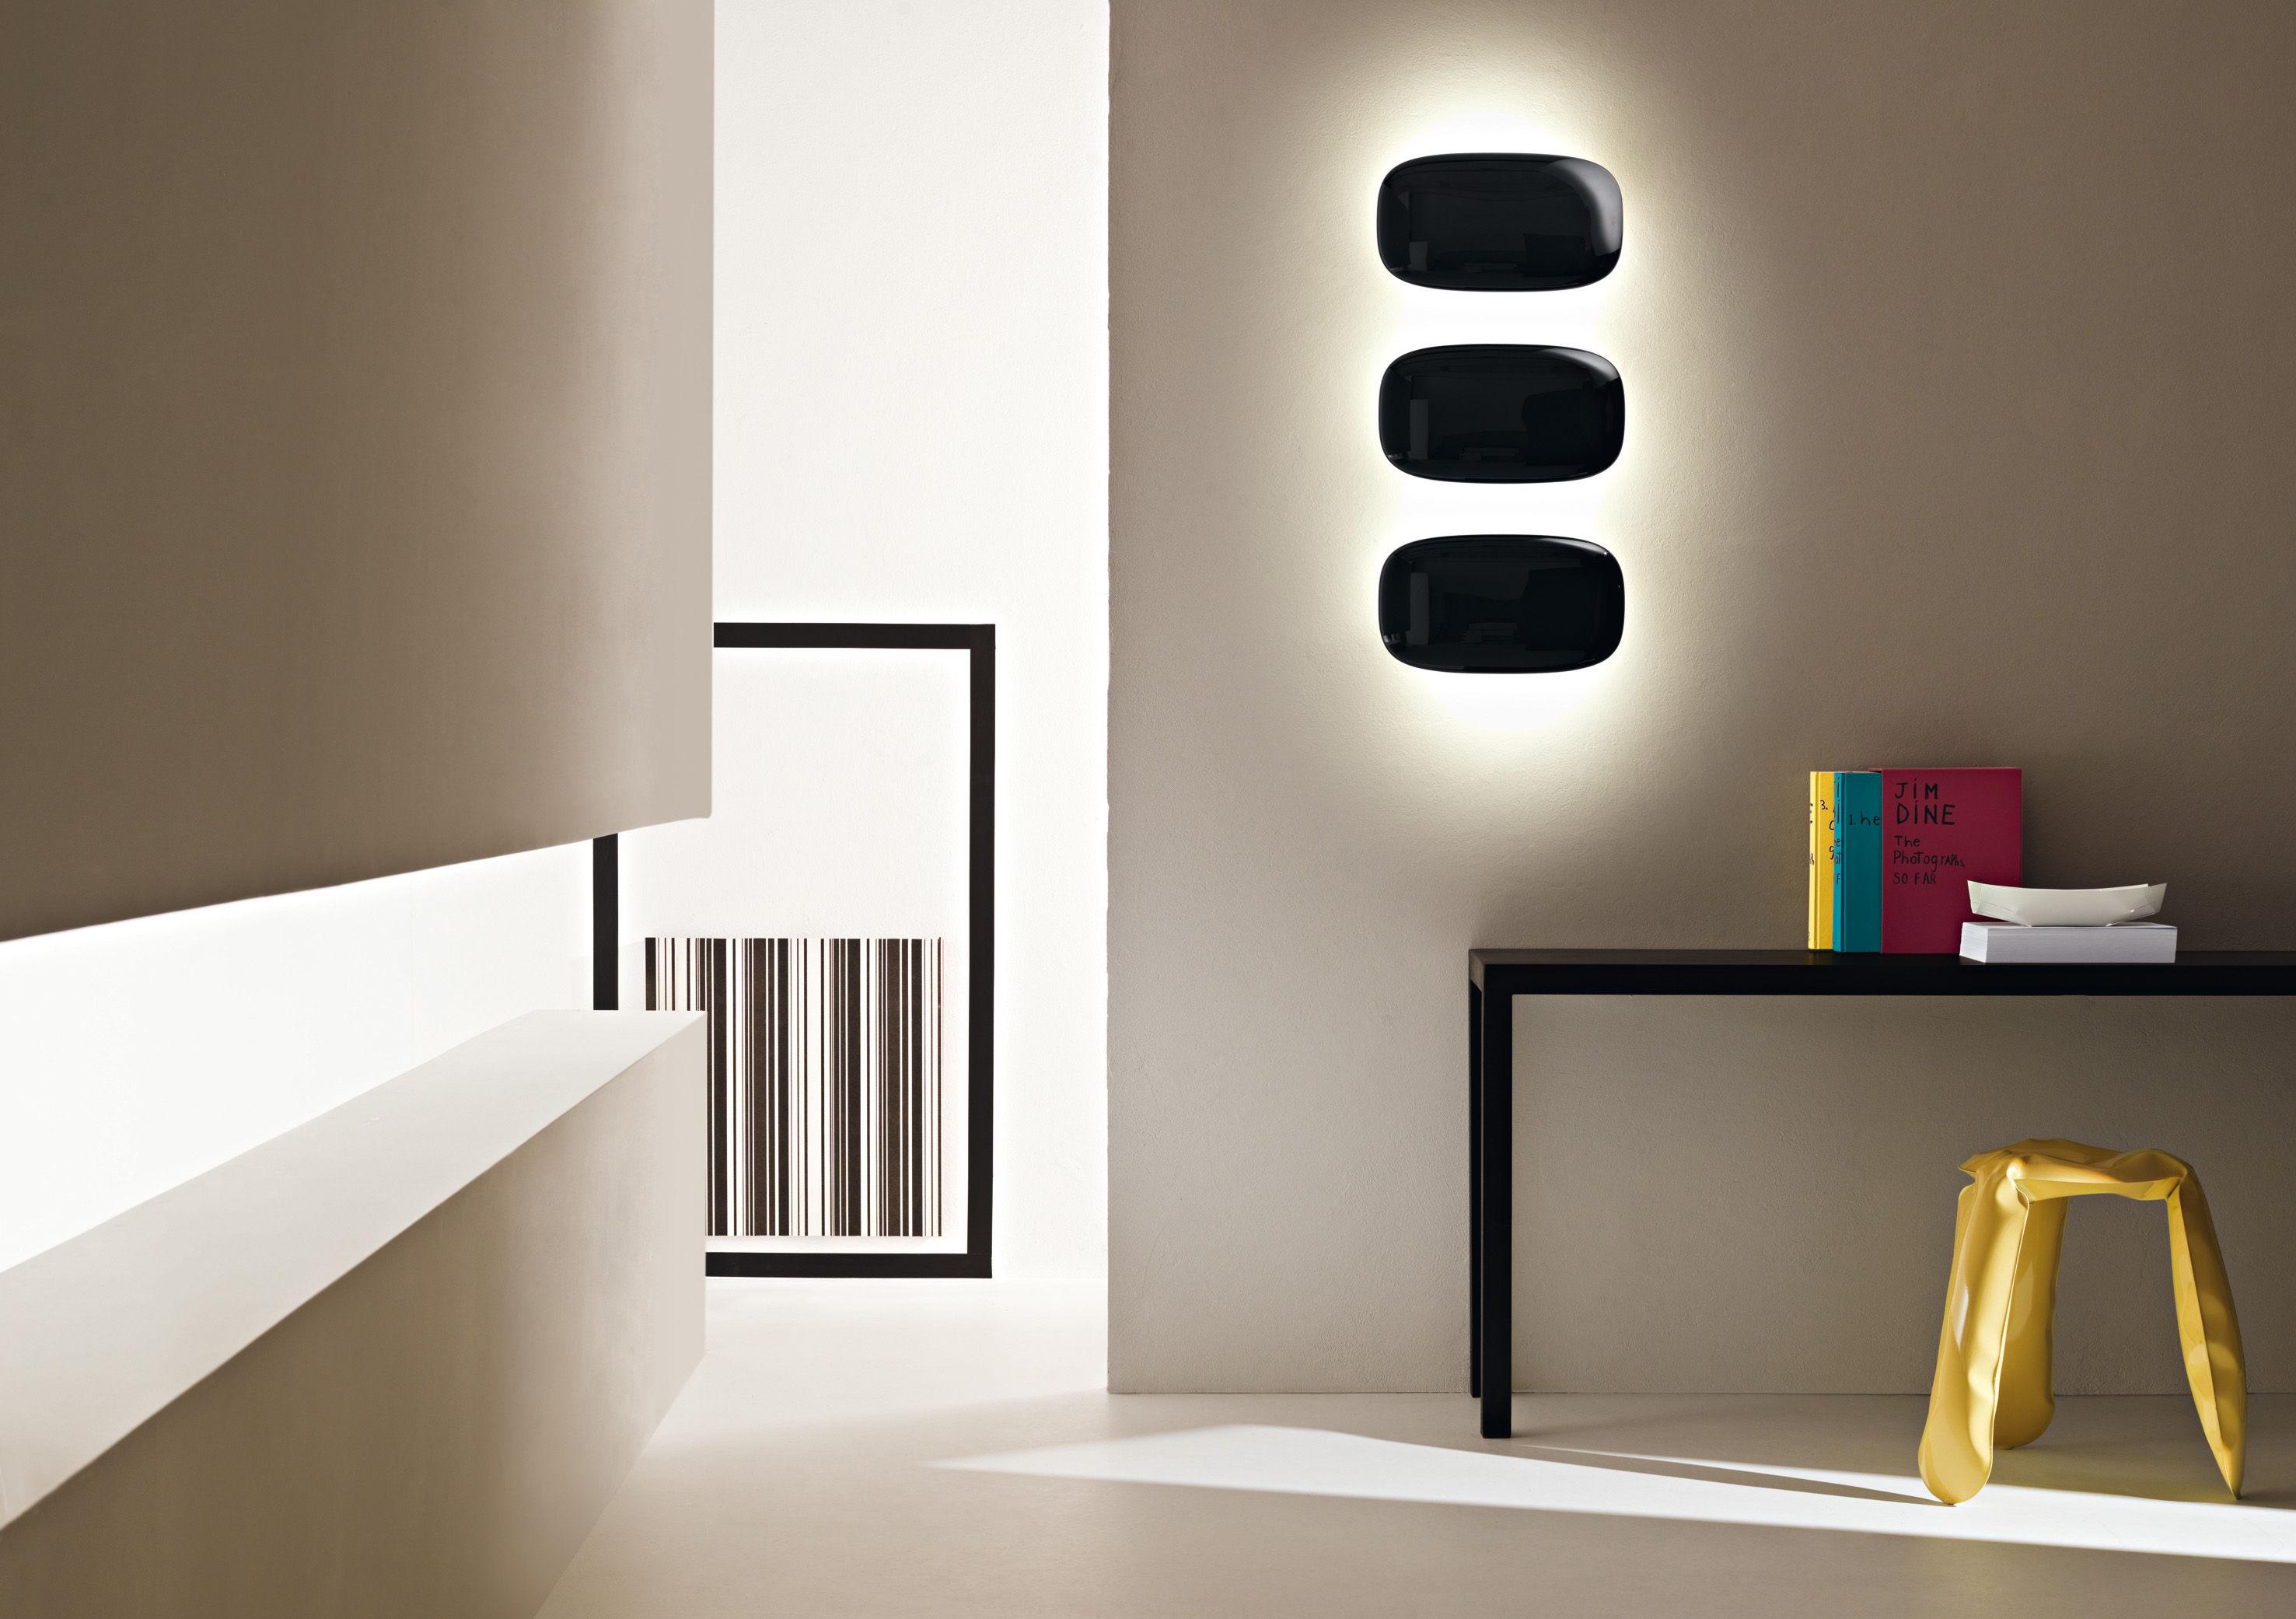 applique tivu l 17 x h 13 cm blanc foscarini. Black Bedroom Furniture Sets. Home Design Ideas